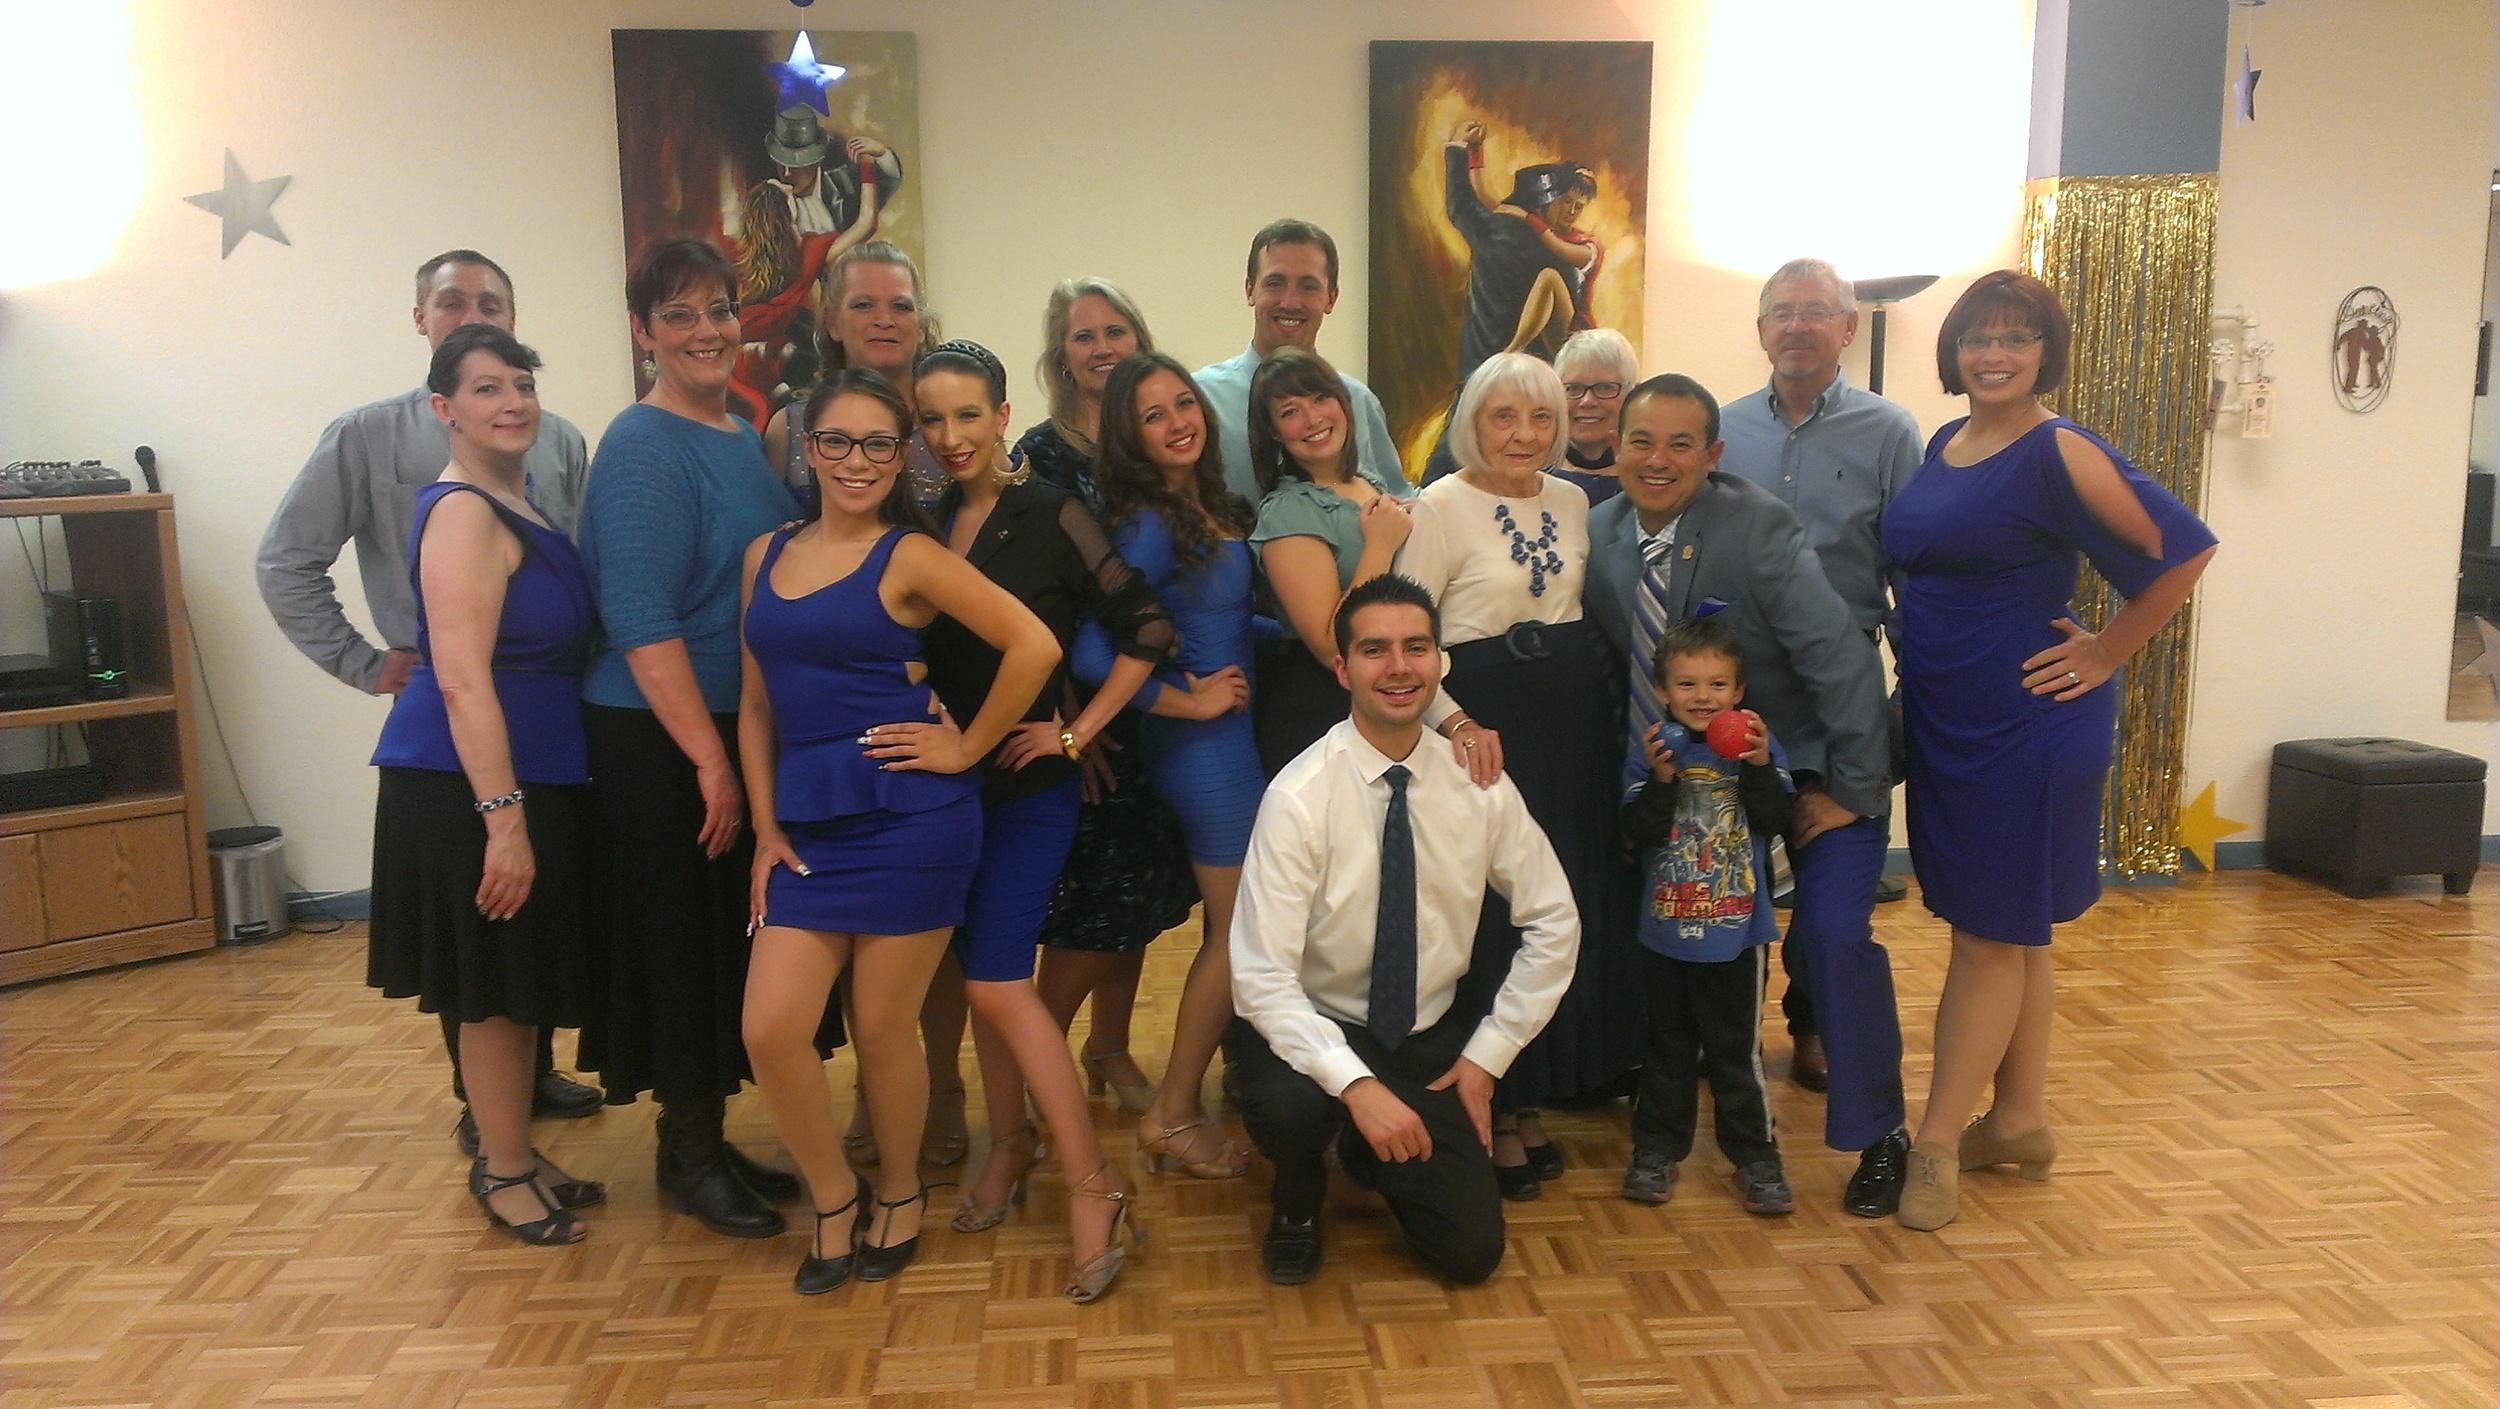 Cool Blue Dance Party